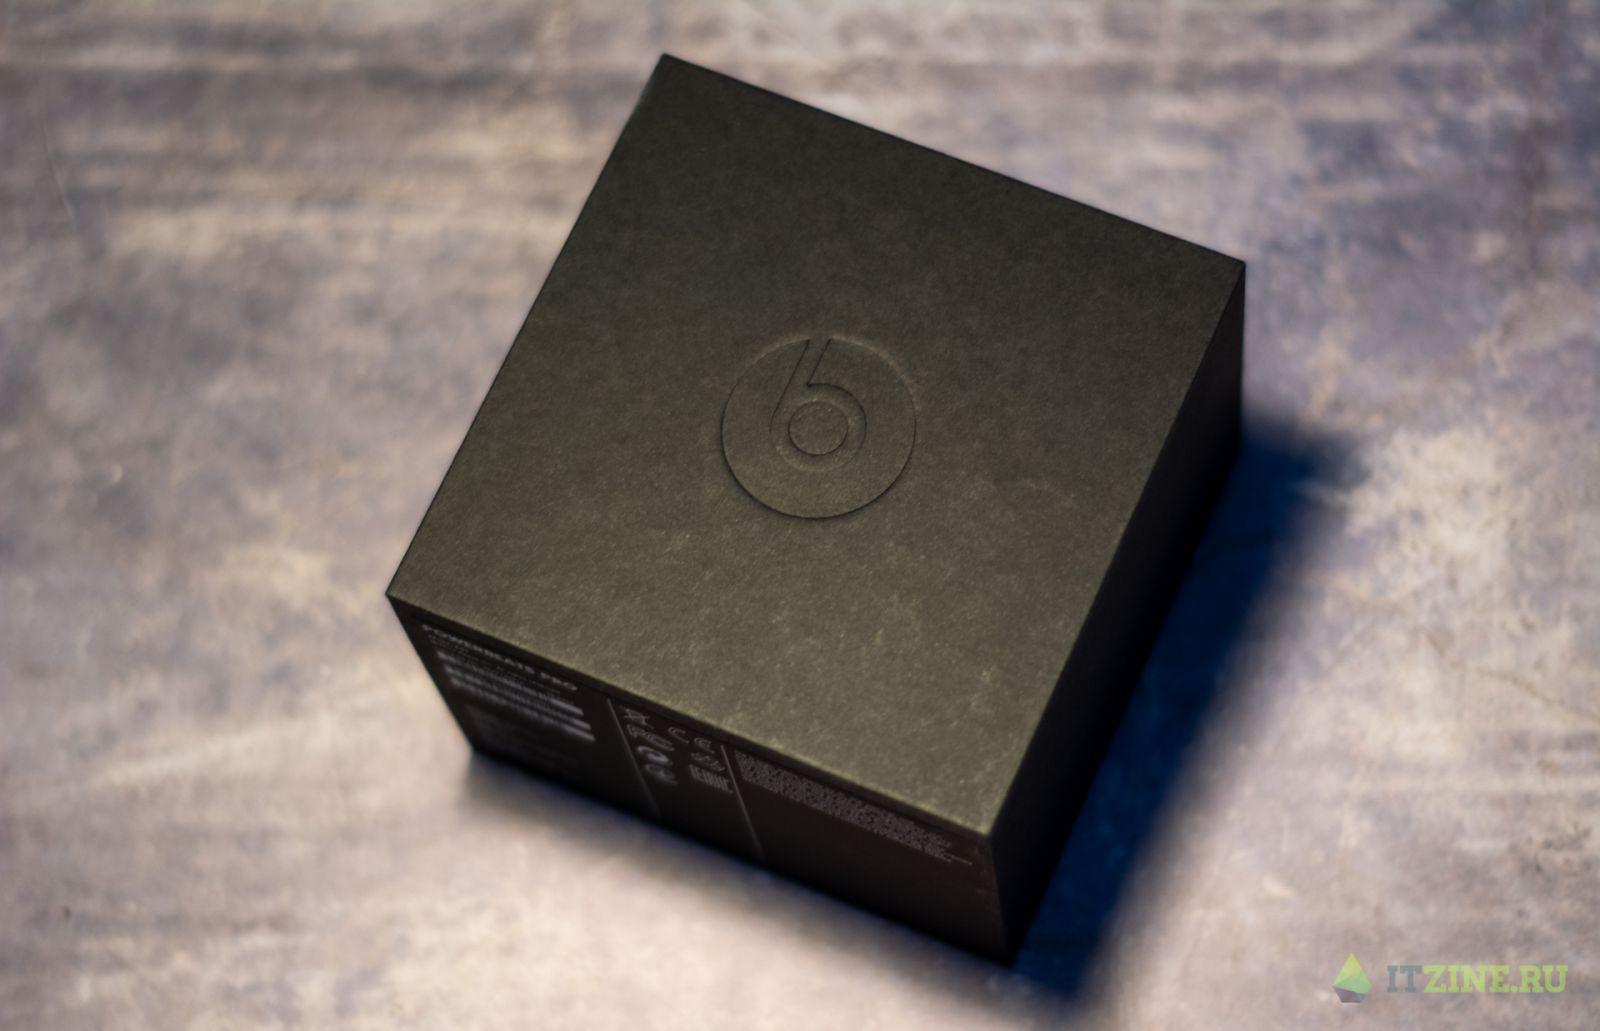 Beats PowerBeats Pro Inner Box Beats PowerBeats Pro Wireless Headphones Review: Sport Is Life